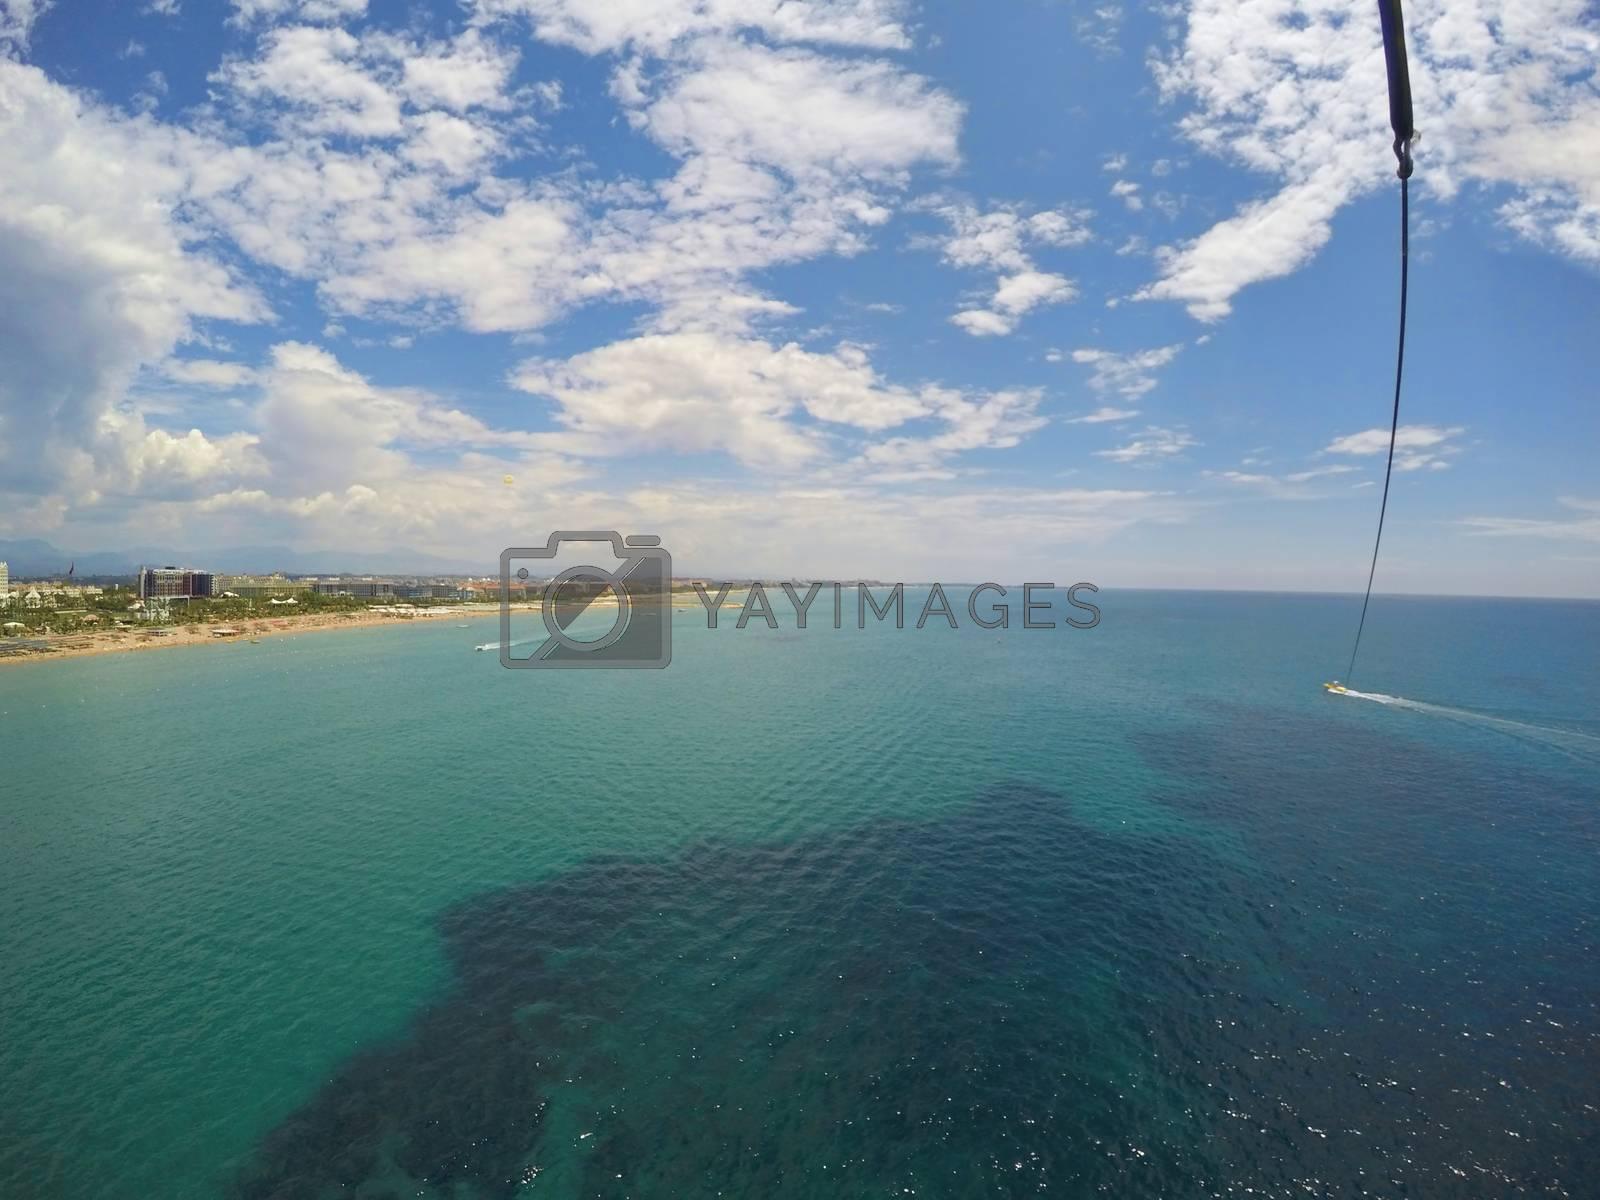 Aerial view of tropical resort during parasailing (speedboat dragging parachute), mediterranean beach in Turkey